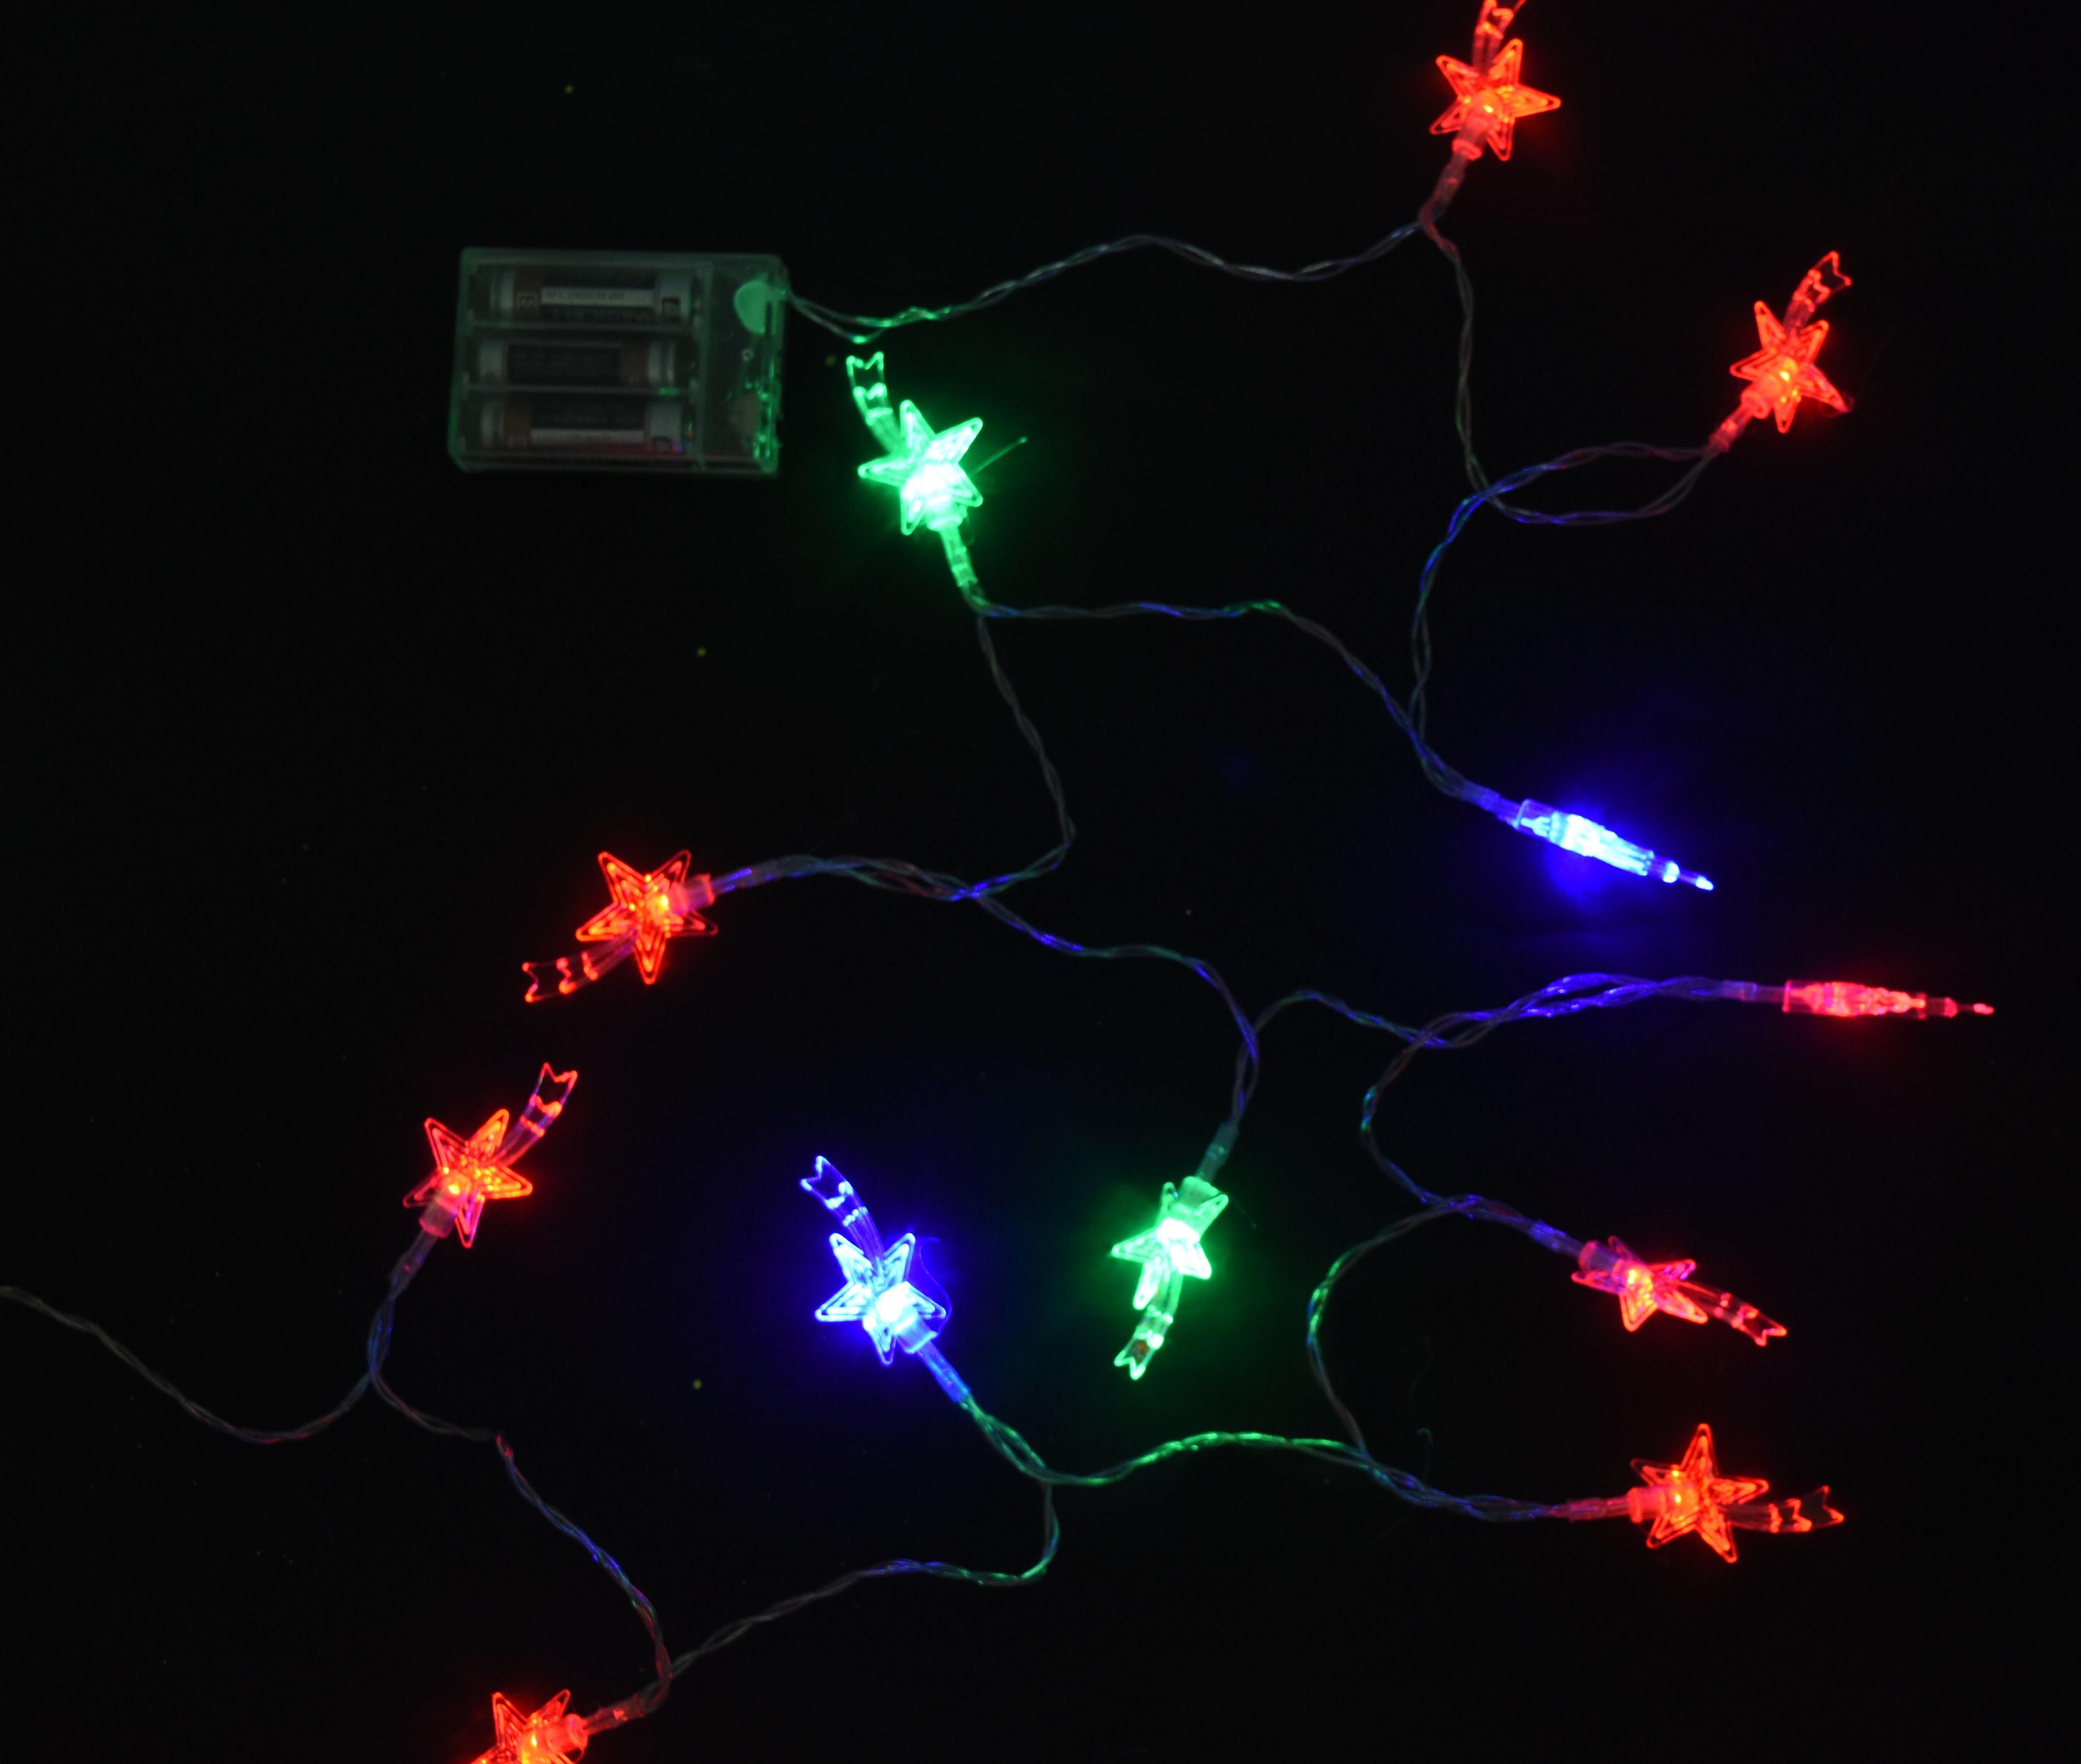 X射線【X411557】20燈LED流星電池燈(彩光),聖誕樹/LED/聖誕燈飾/造型燈/聖誕佈置/裝飾燈/聖誕樹